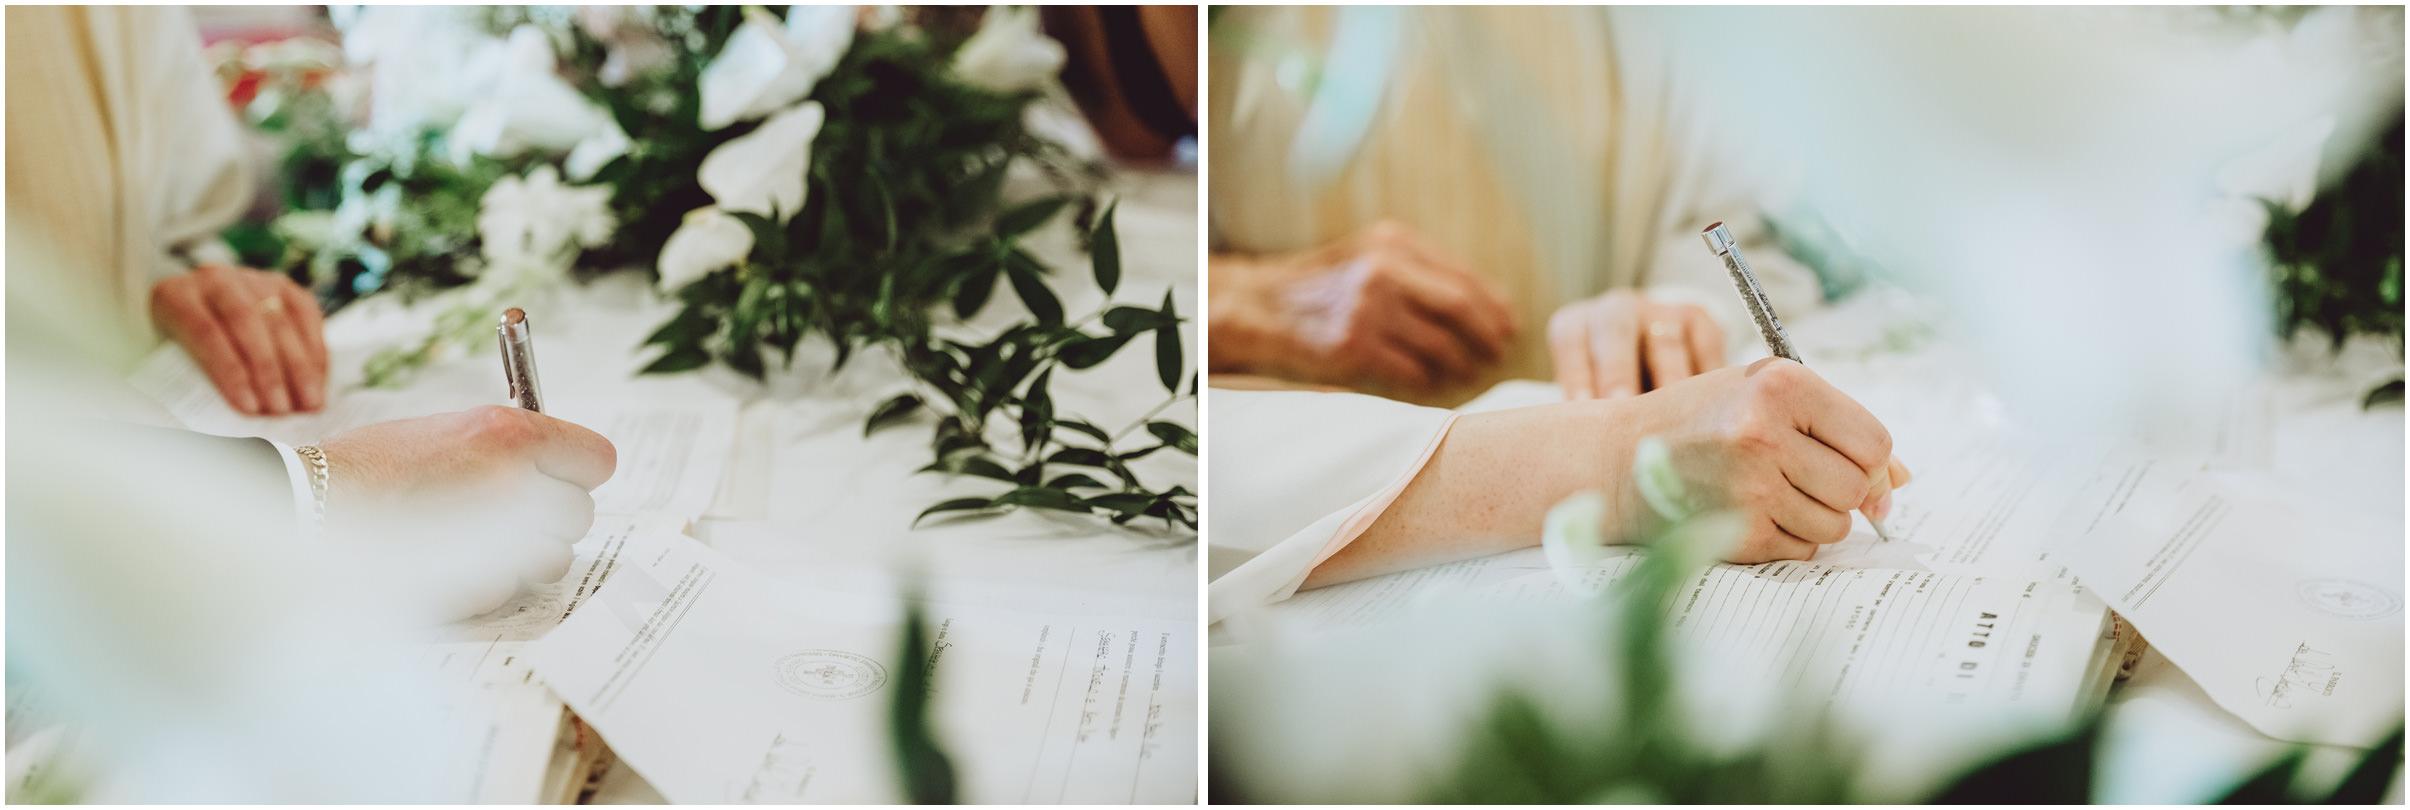 WEDDING-PHOTOGRAPHY-SARA-LORENZONI-FOTOGRAFIA-MATRIMONIO-ORVIETO-JUKA-ANTONELLO23